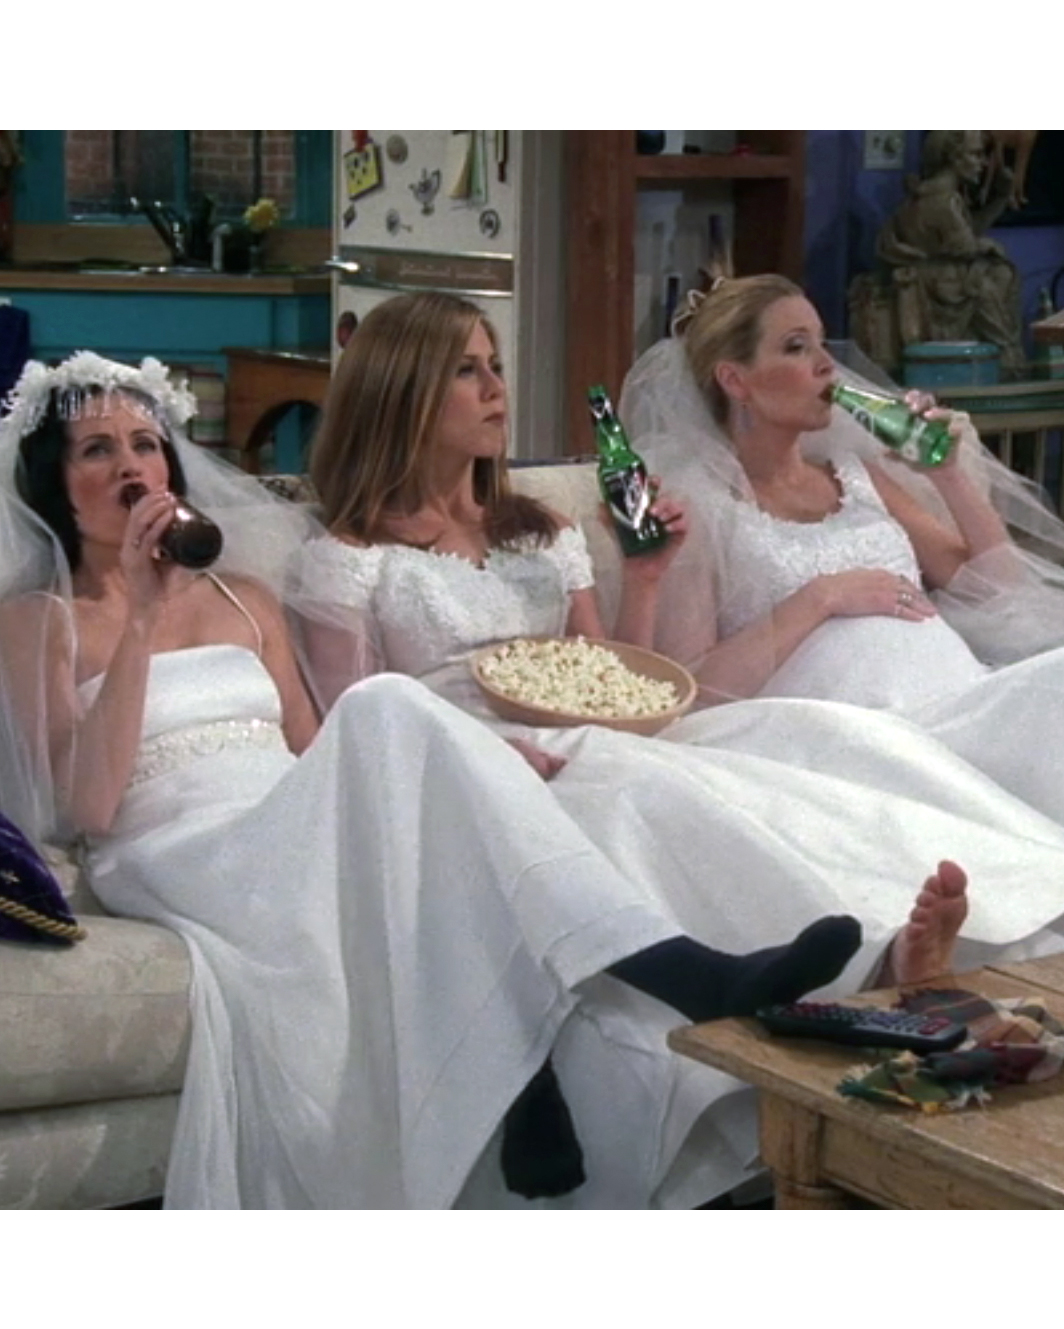 tv-wedding-dresses-friends-monica-rachel-phoebe-1115.jpg